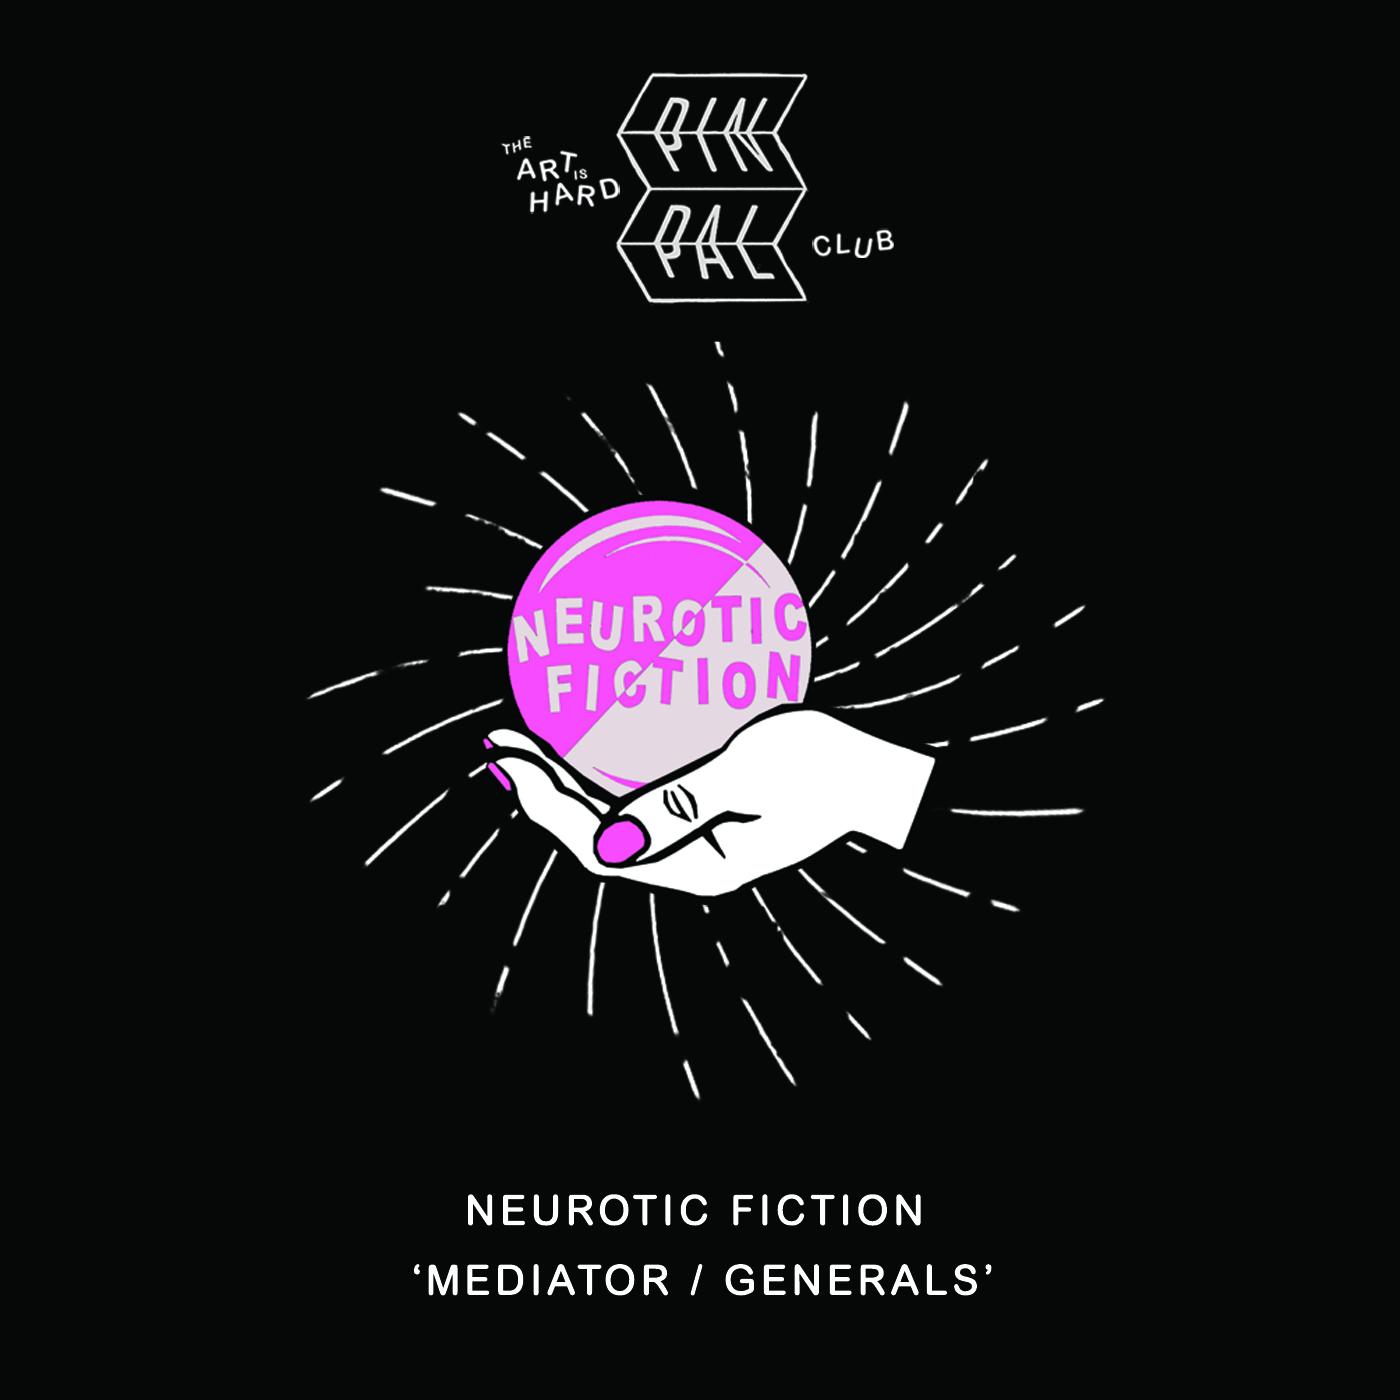 Neurotic Fiction - Mediator / Generals (1